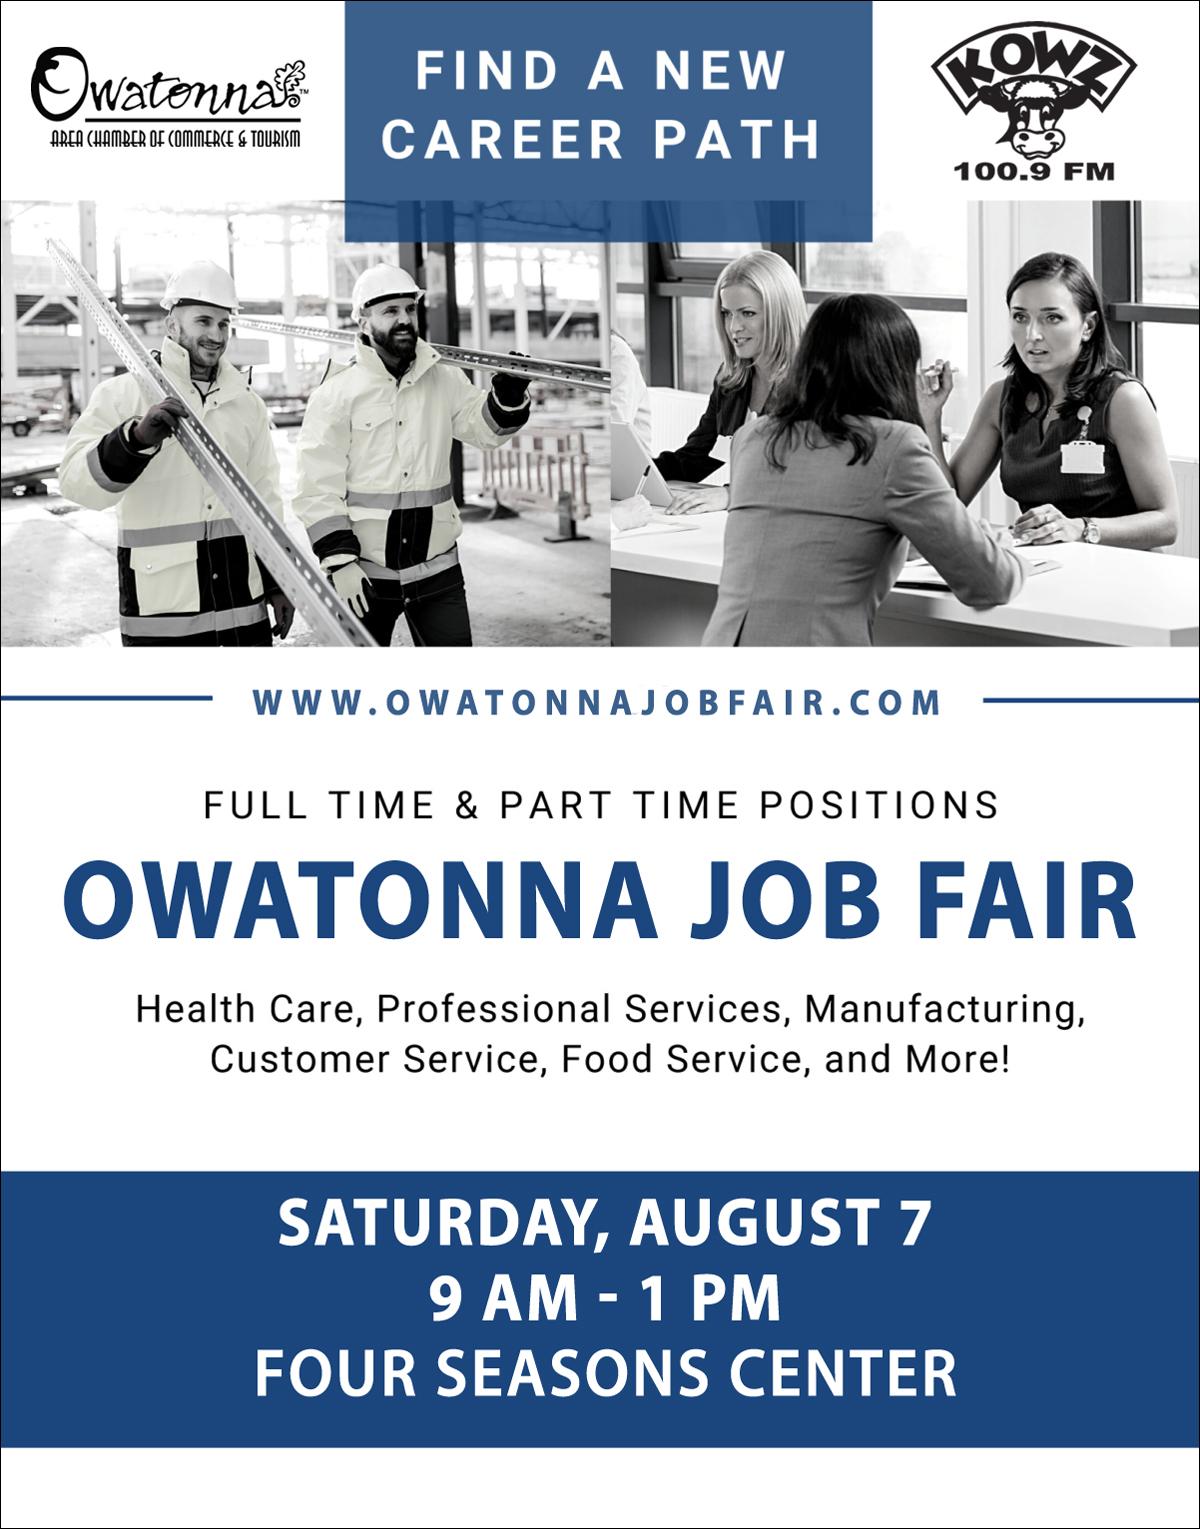 Owatonna Job Fair